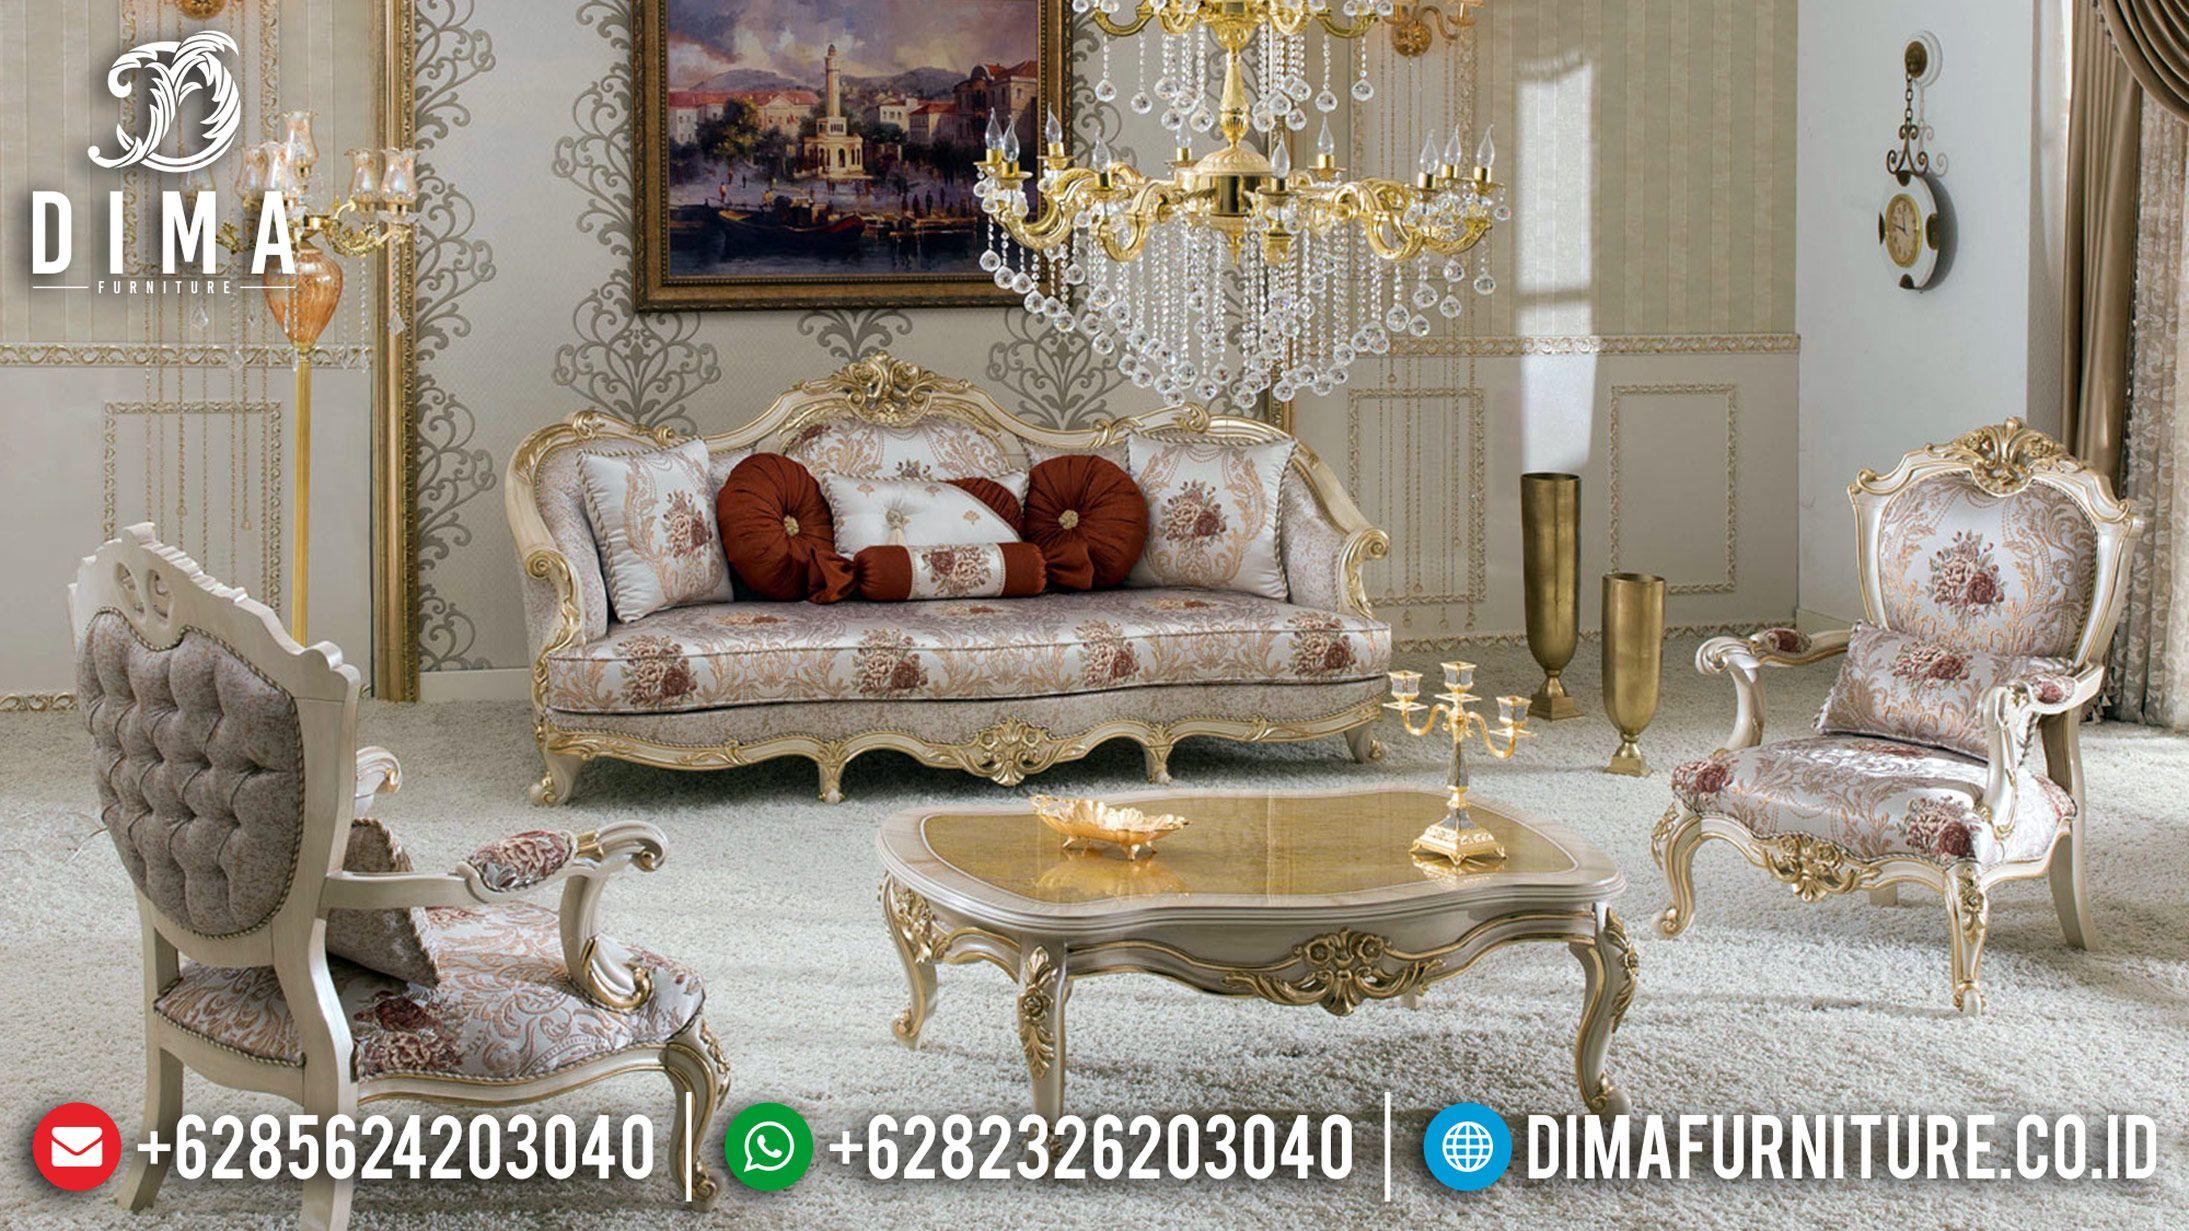 Kursi Sofa Tamu Mewah New Sofa Mewah Classic Kursi Tamu Jepara Gold Duco Df 1218 Luxury Furniture Sofa Modern Furniture Sofas Wooden Sofa Designs